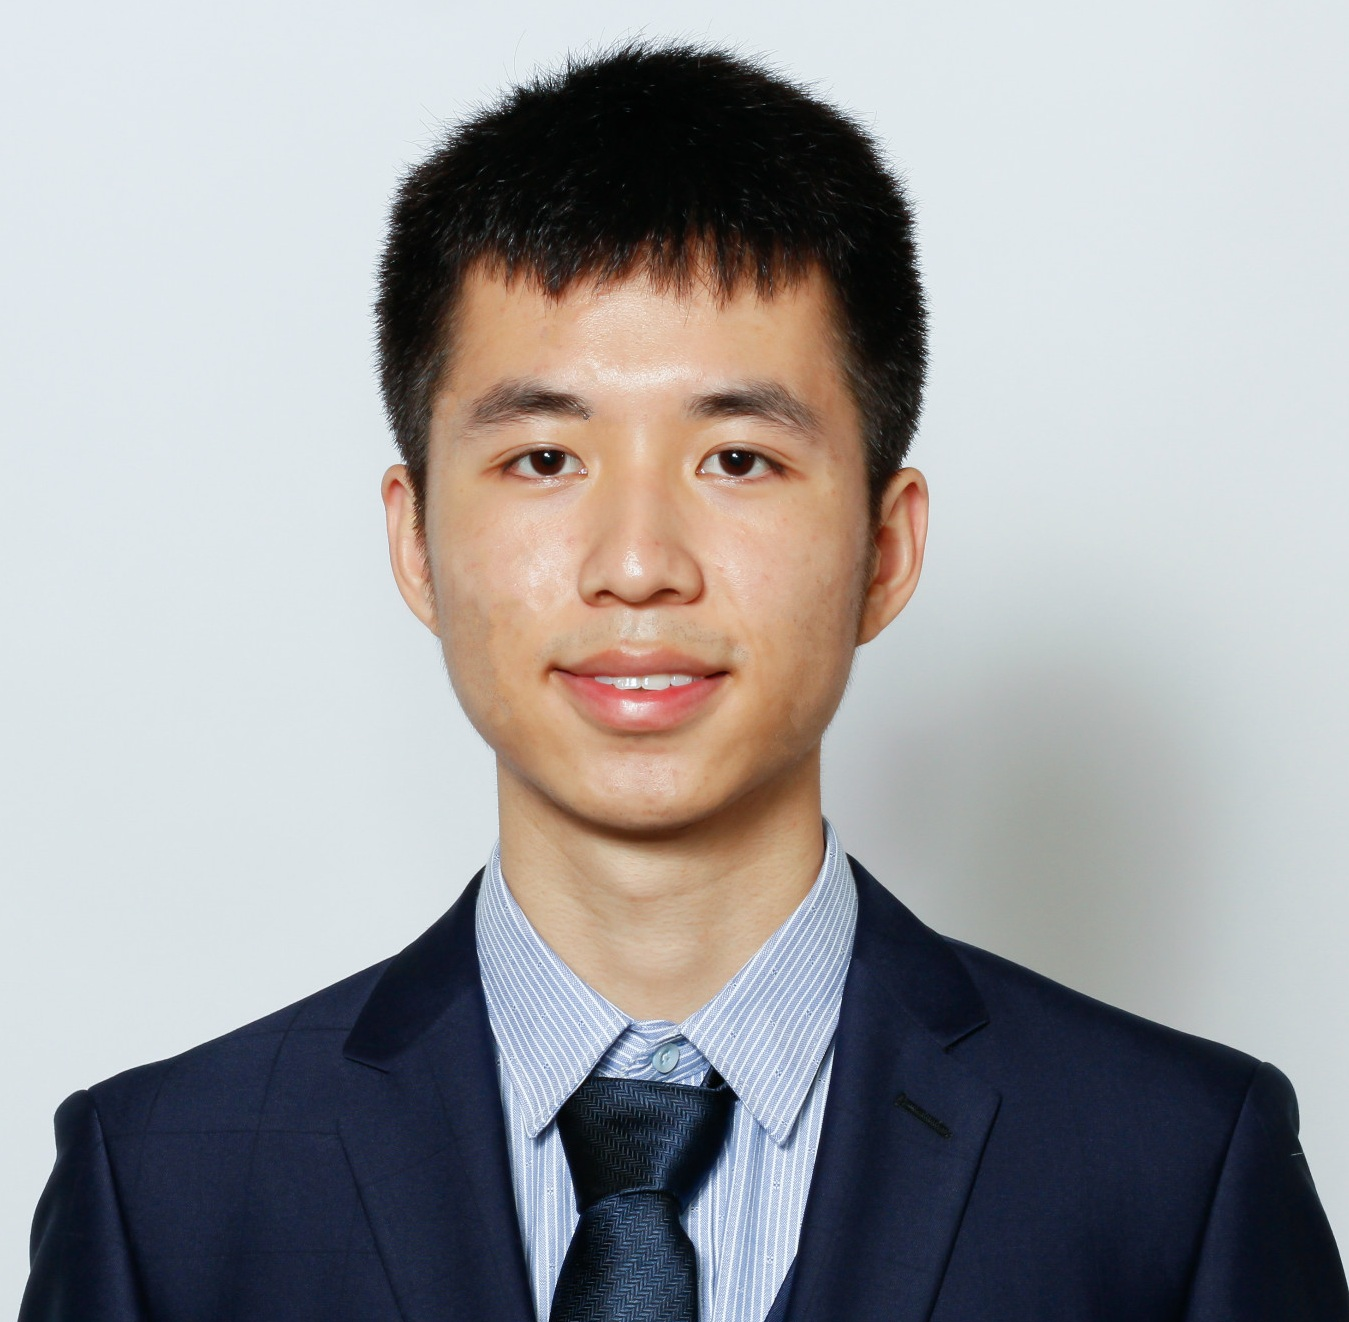 Master Student, Bioinformatics